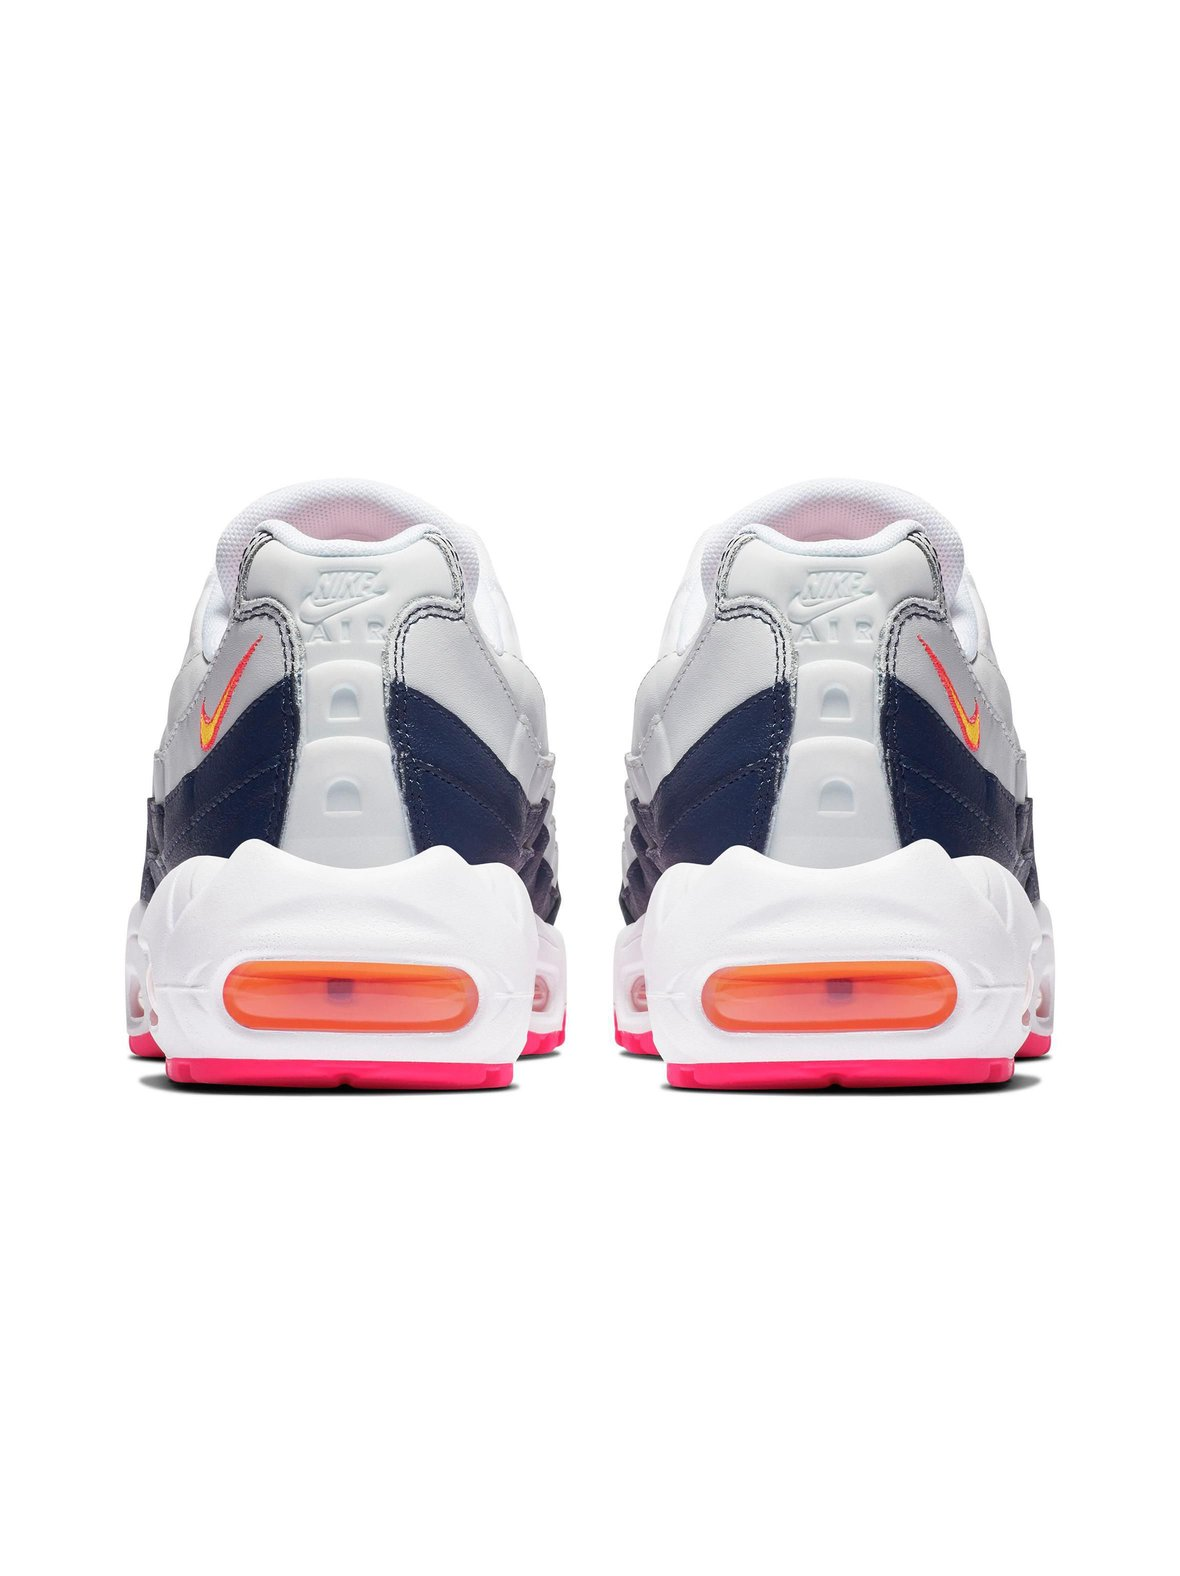 uk availability 034e8 30de1 W Air Max 95 Premium -sneakerit